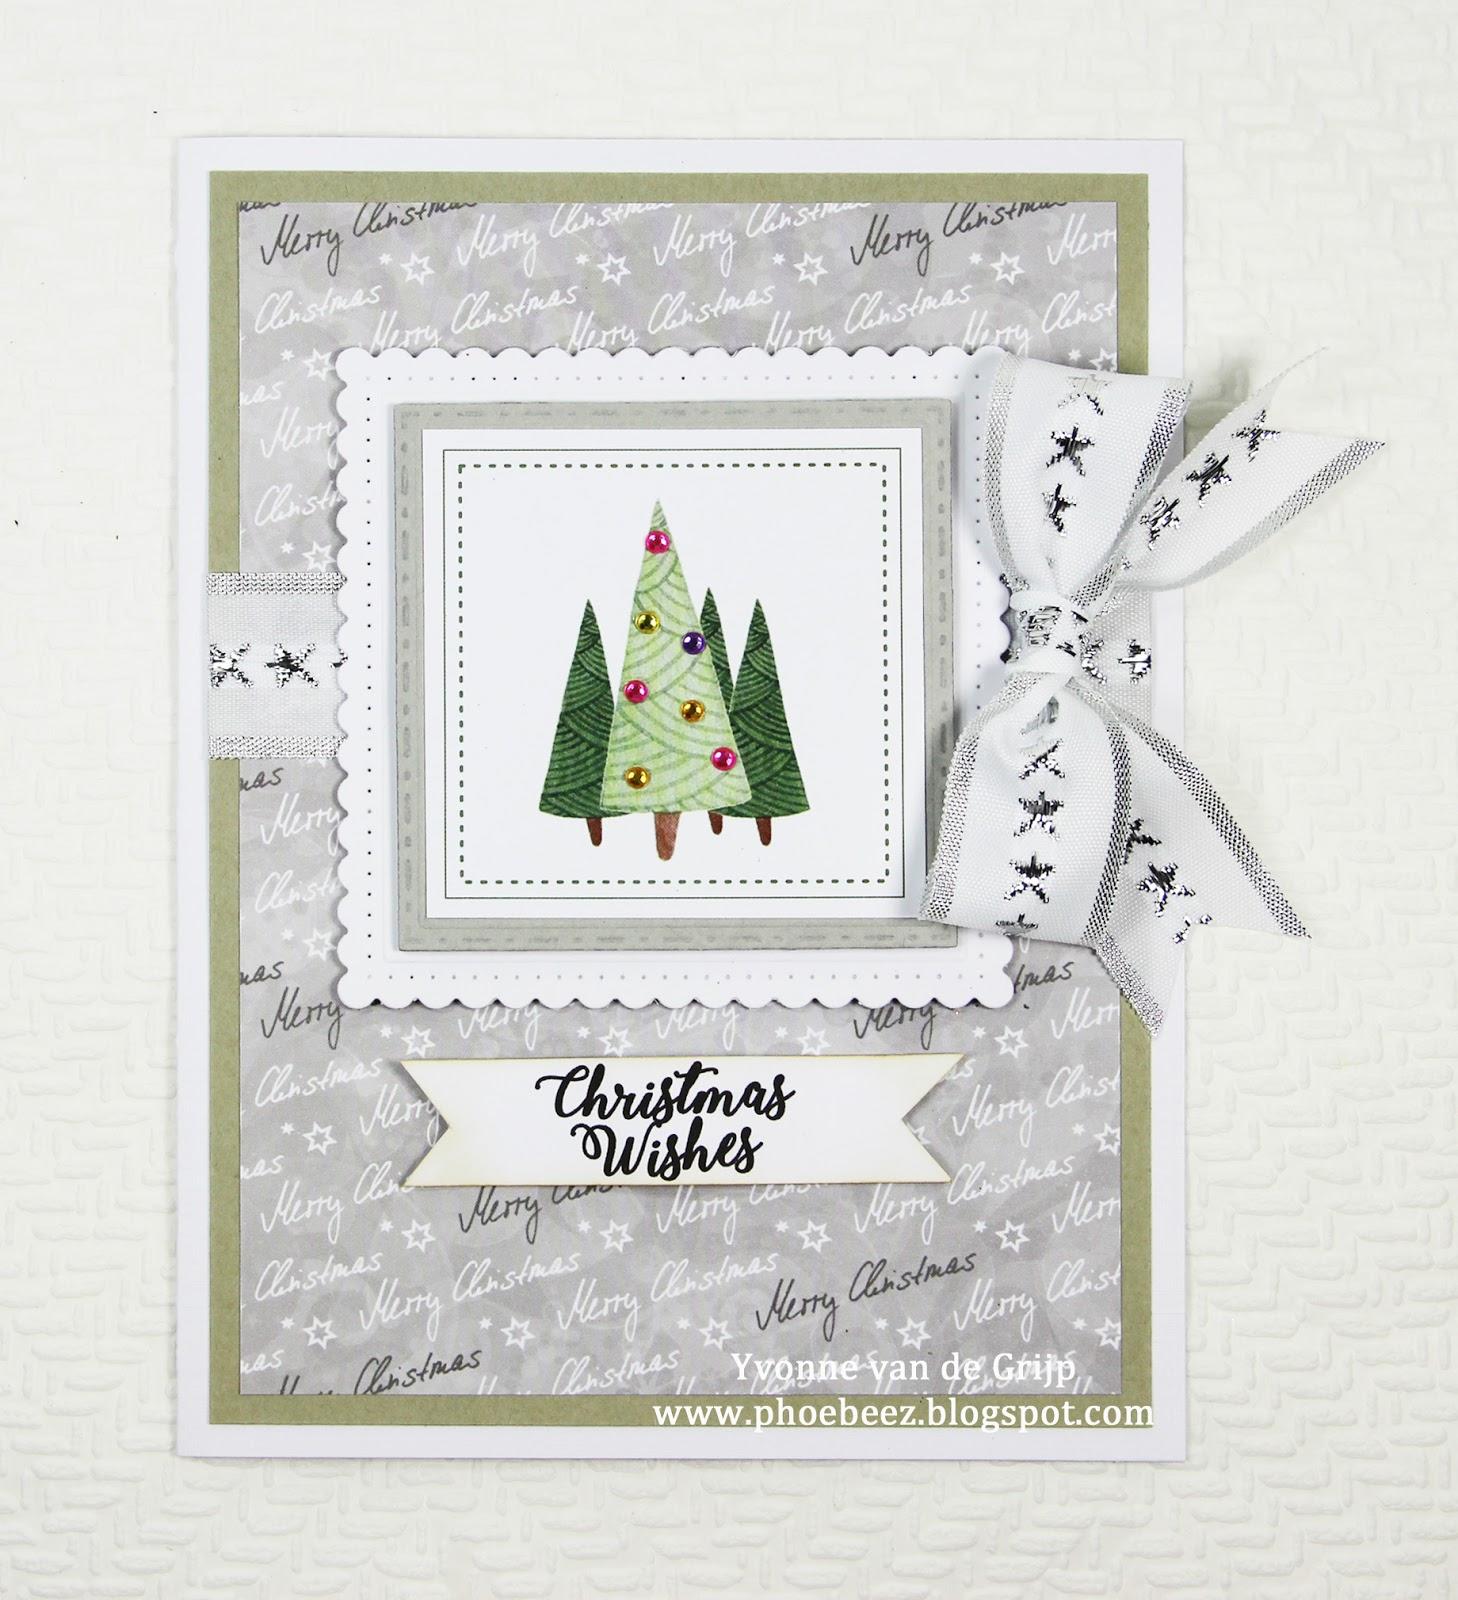 Phoebeez: LOTV Christmas card